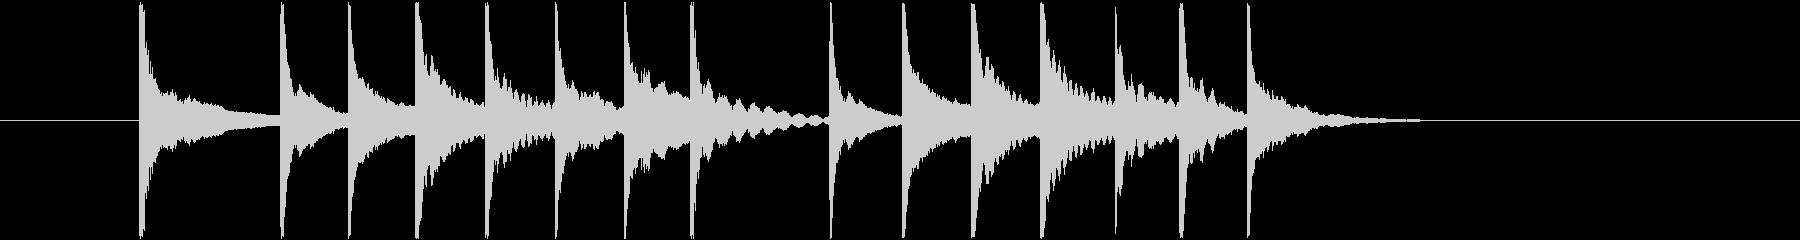 youtubeオープニング風SE 木琴3の未再生の波形